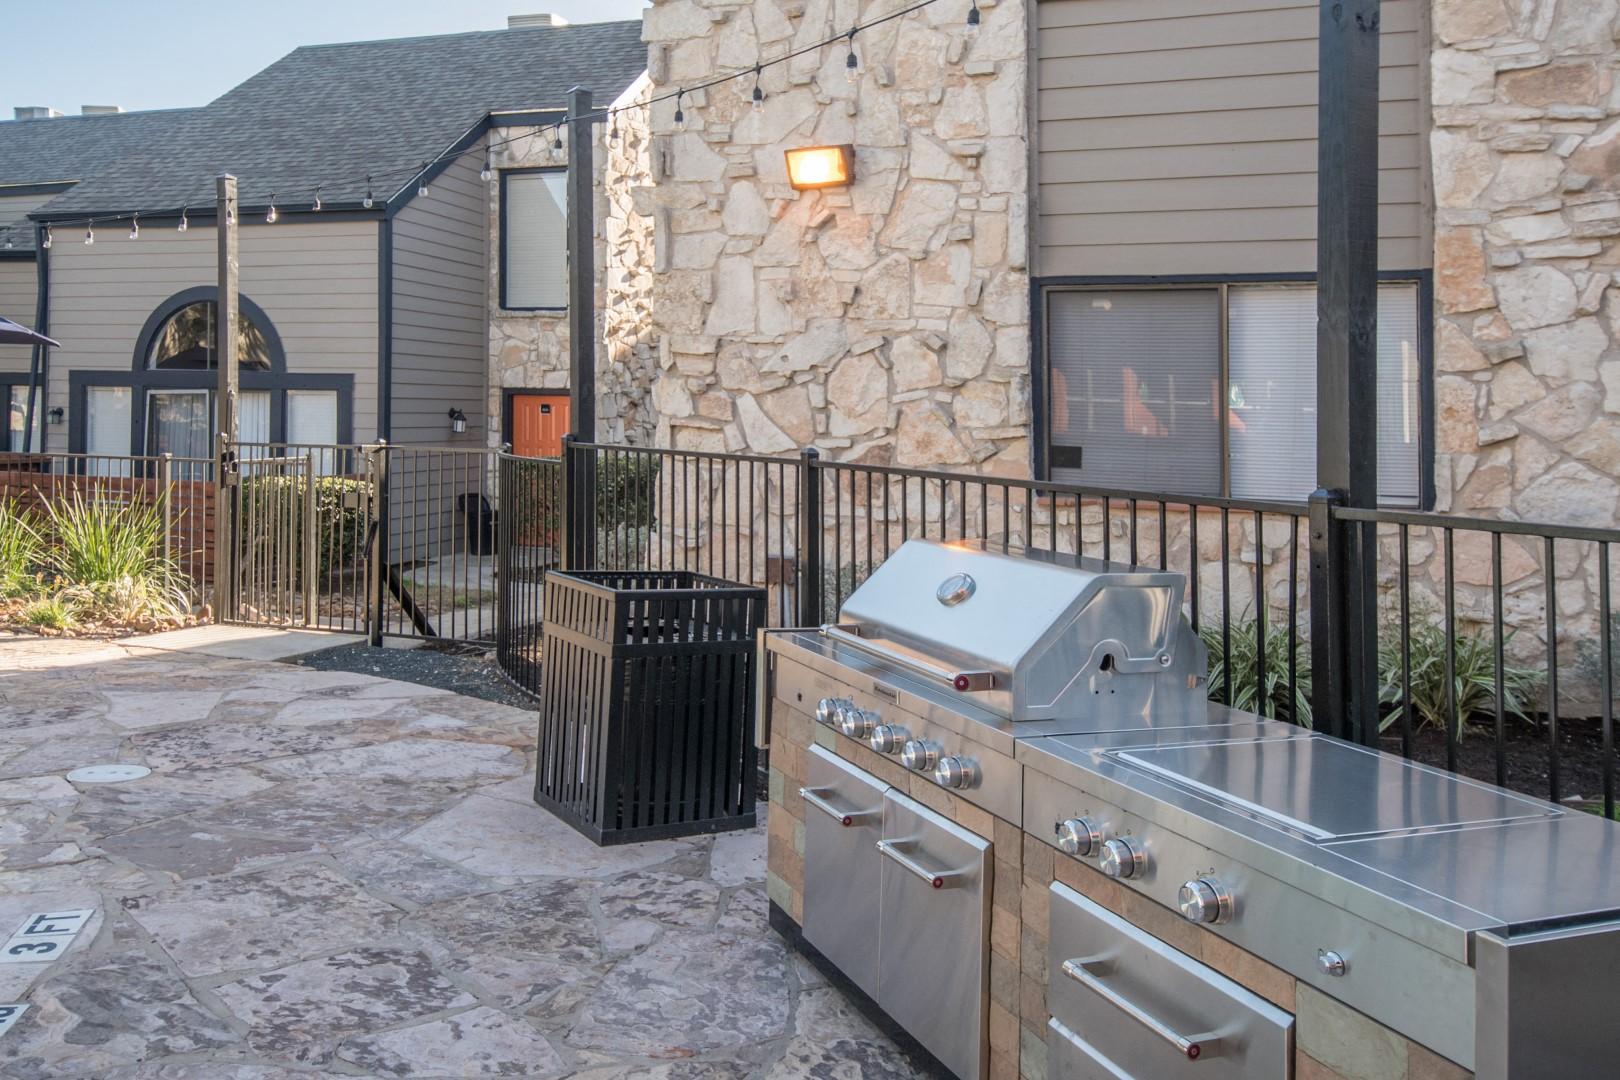 grill northwest san antonio apartments